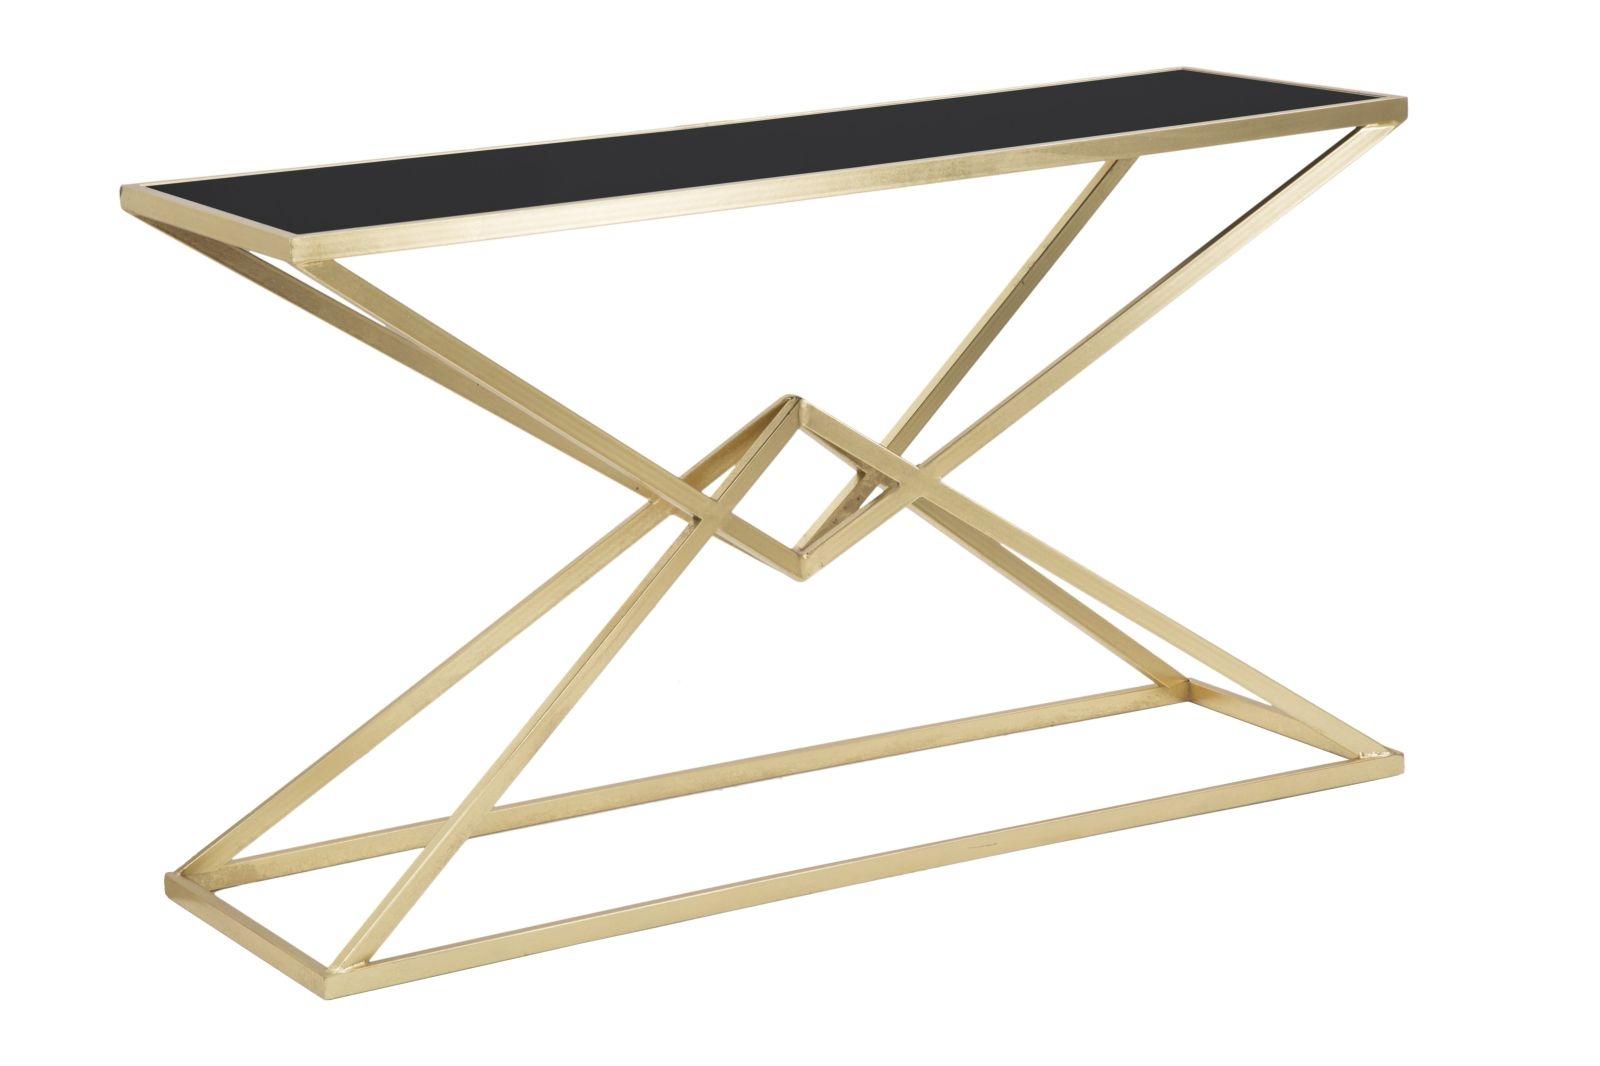 Consola din metal si sticla Piramid Gold / Black, l130xA40xH75 cm